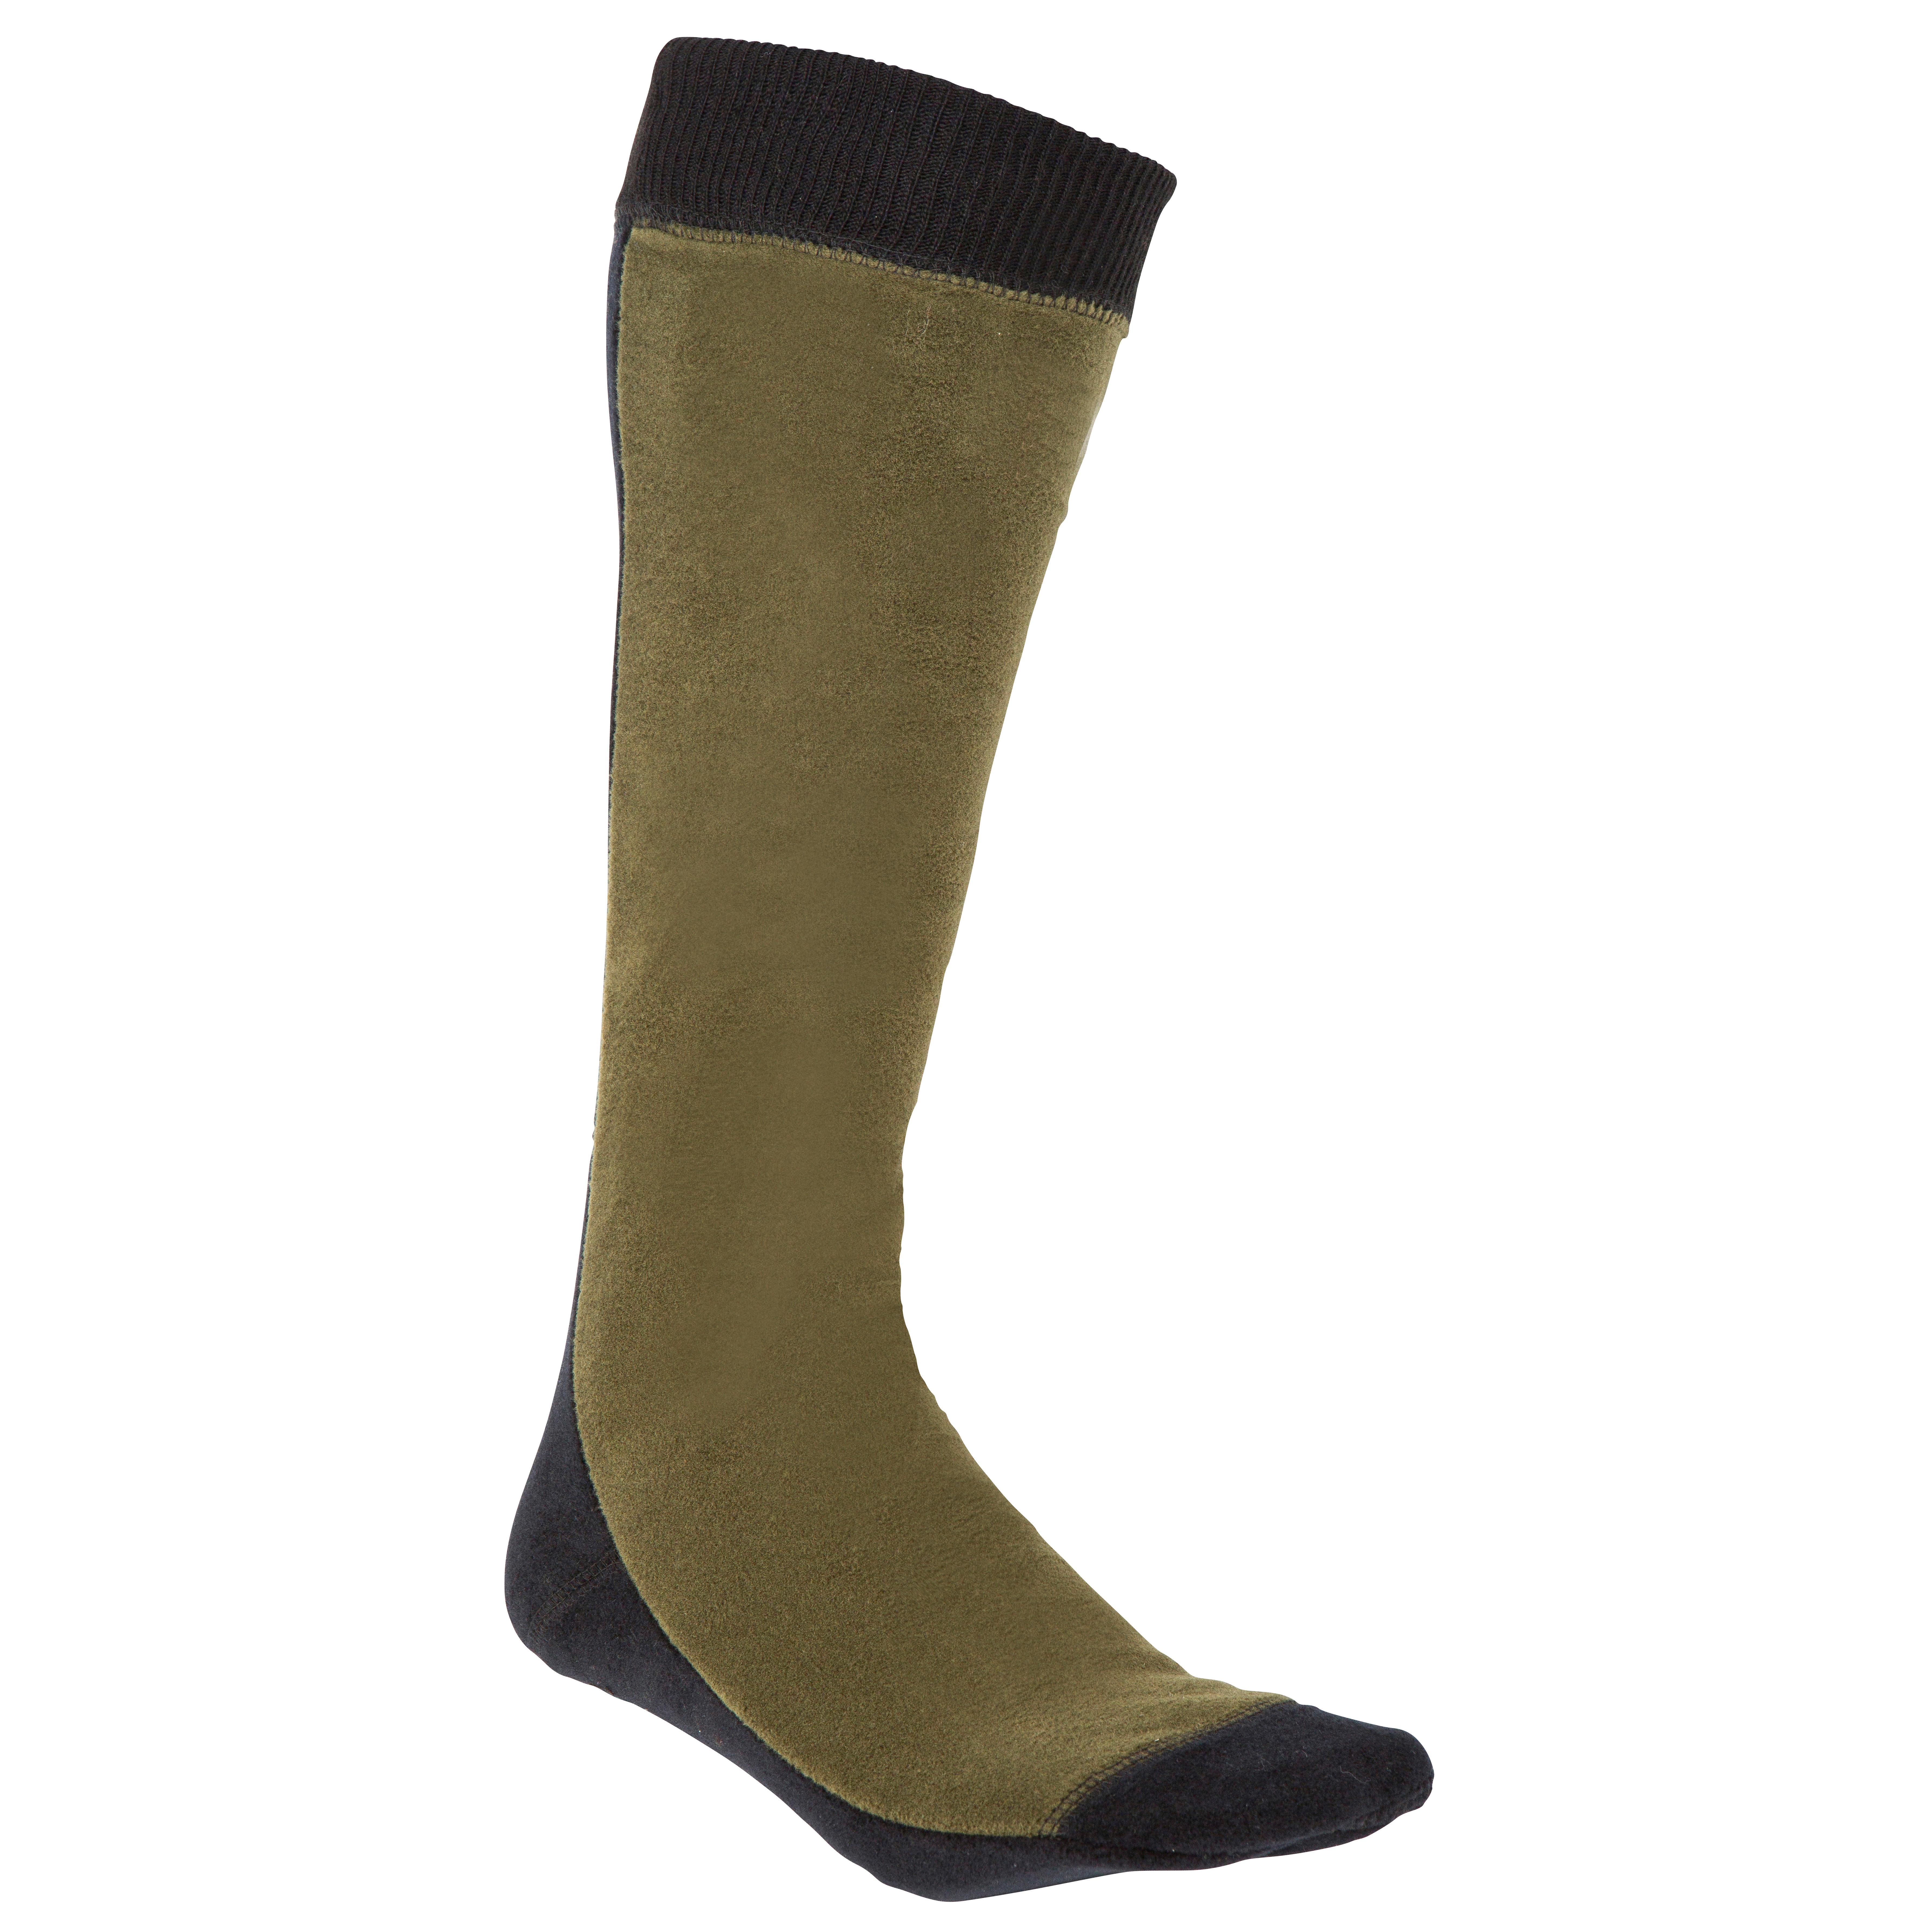 500 Fleece Hunting Socks - Green